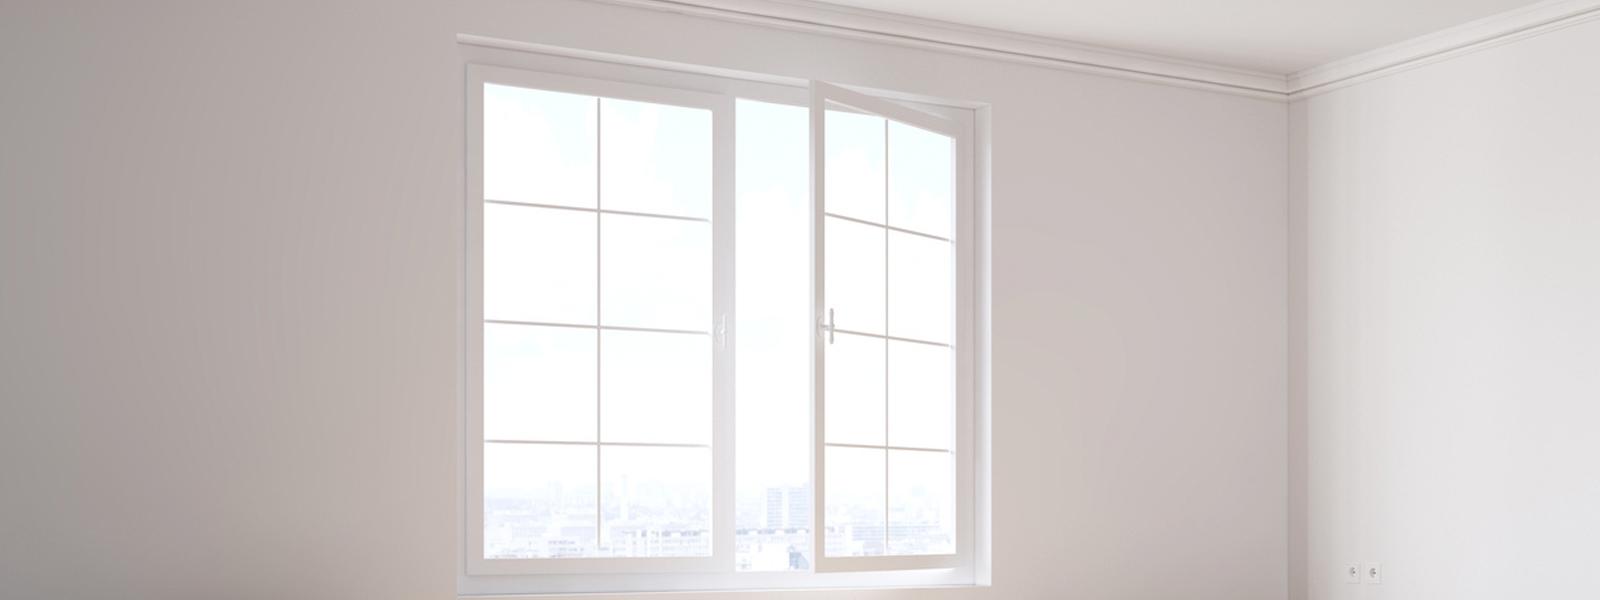 montage service dzinic freiburg t ren fenster b den. Black Bedroom Furniture Sets. Home Design Ideas